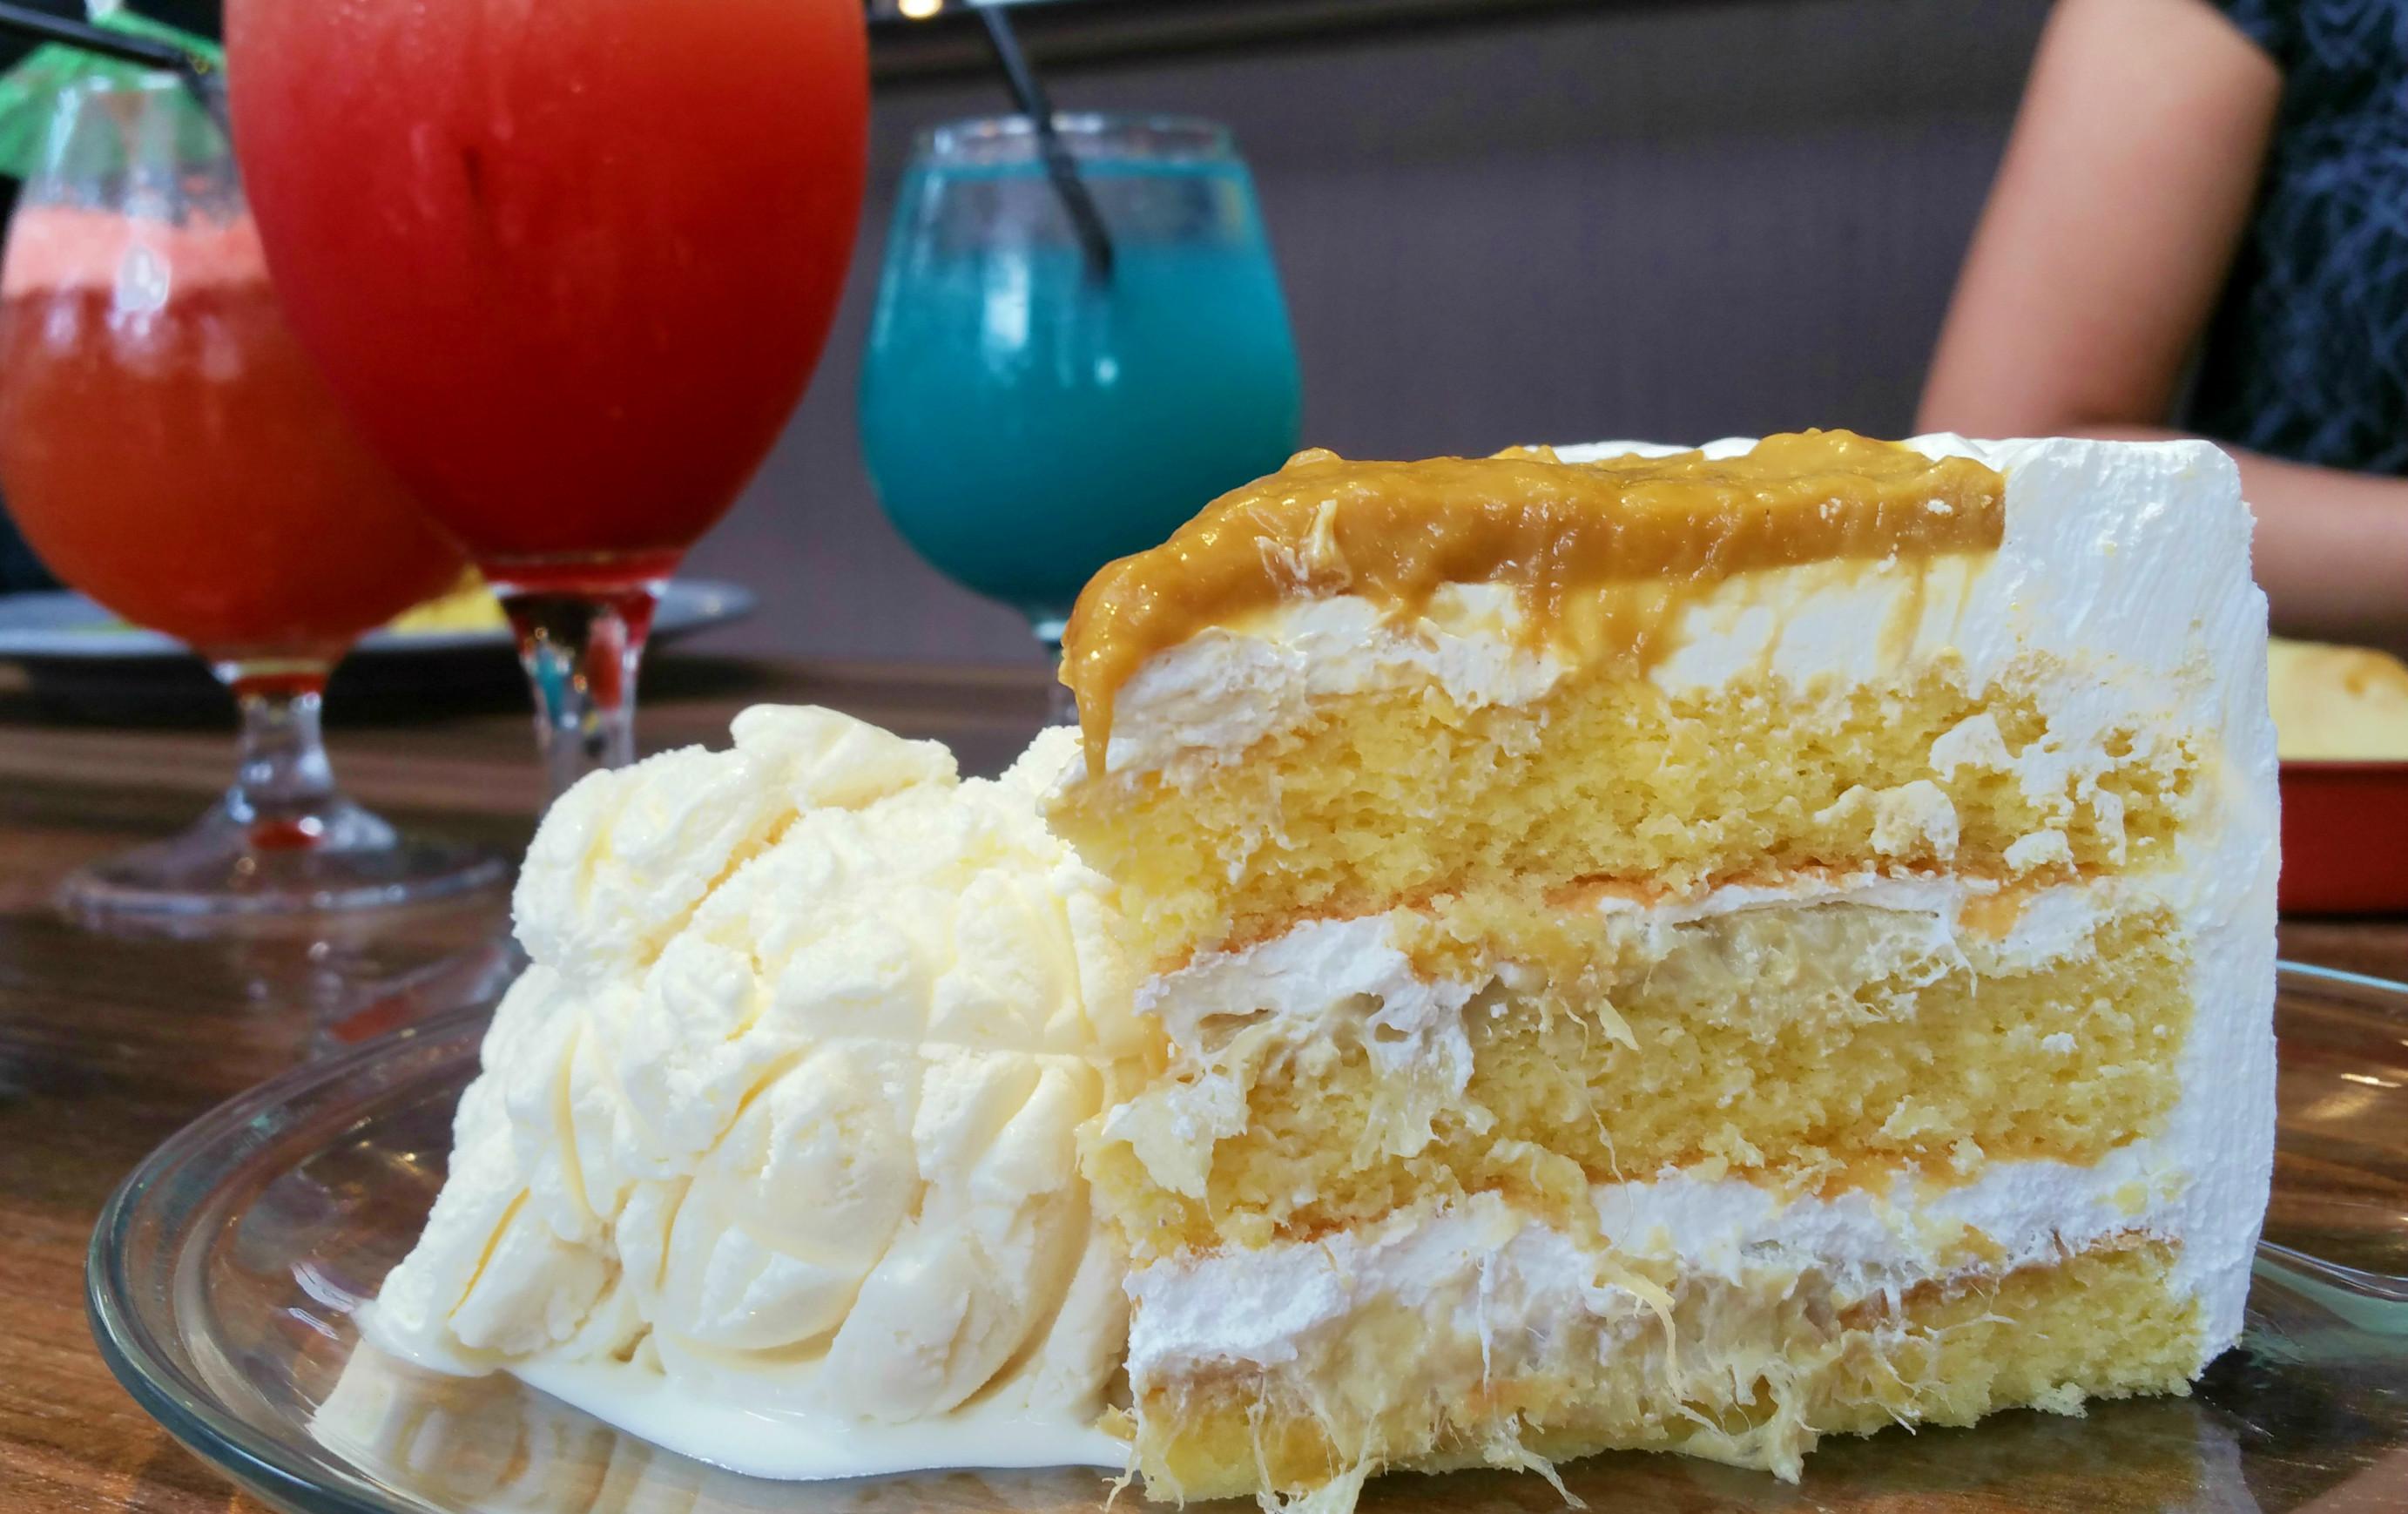 Halal Noosh durian pengat cake